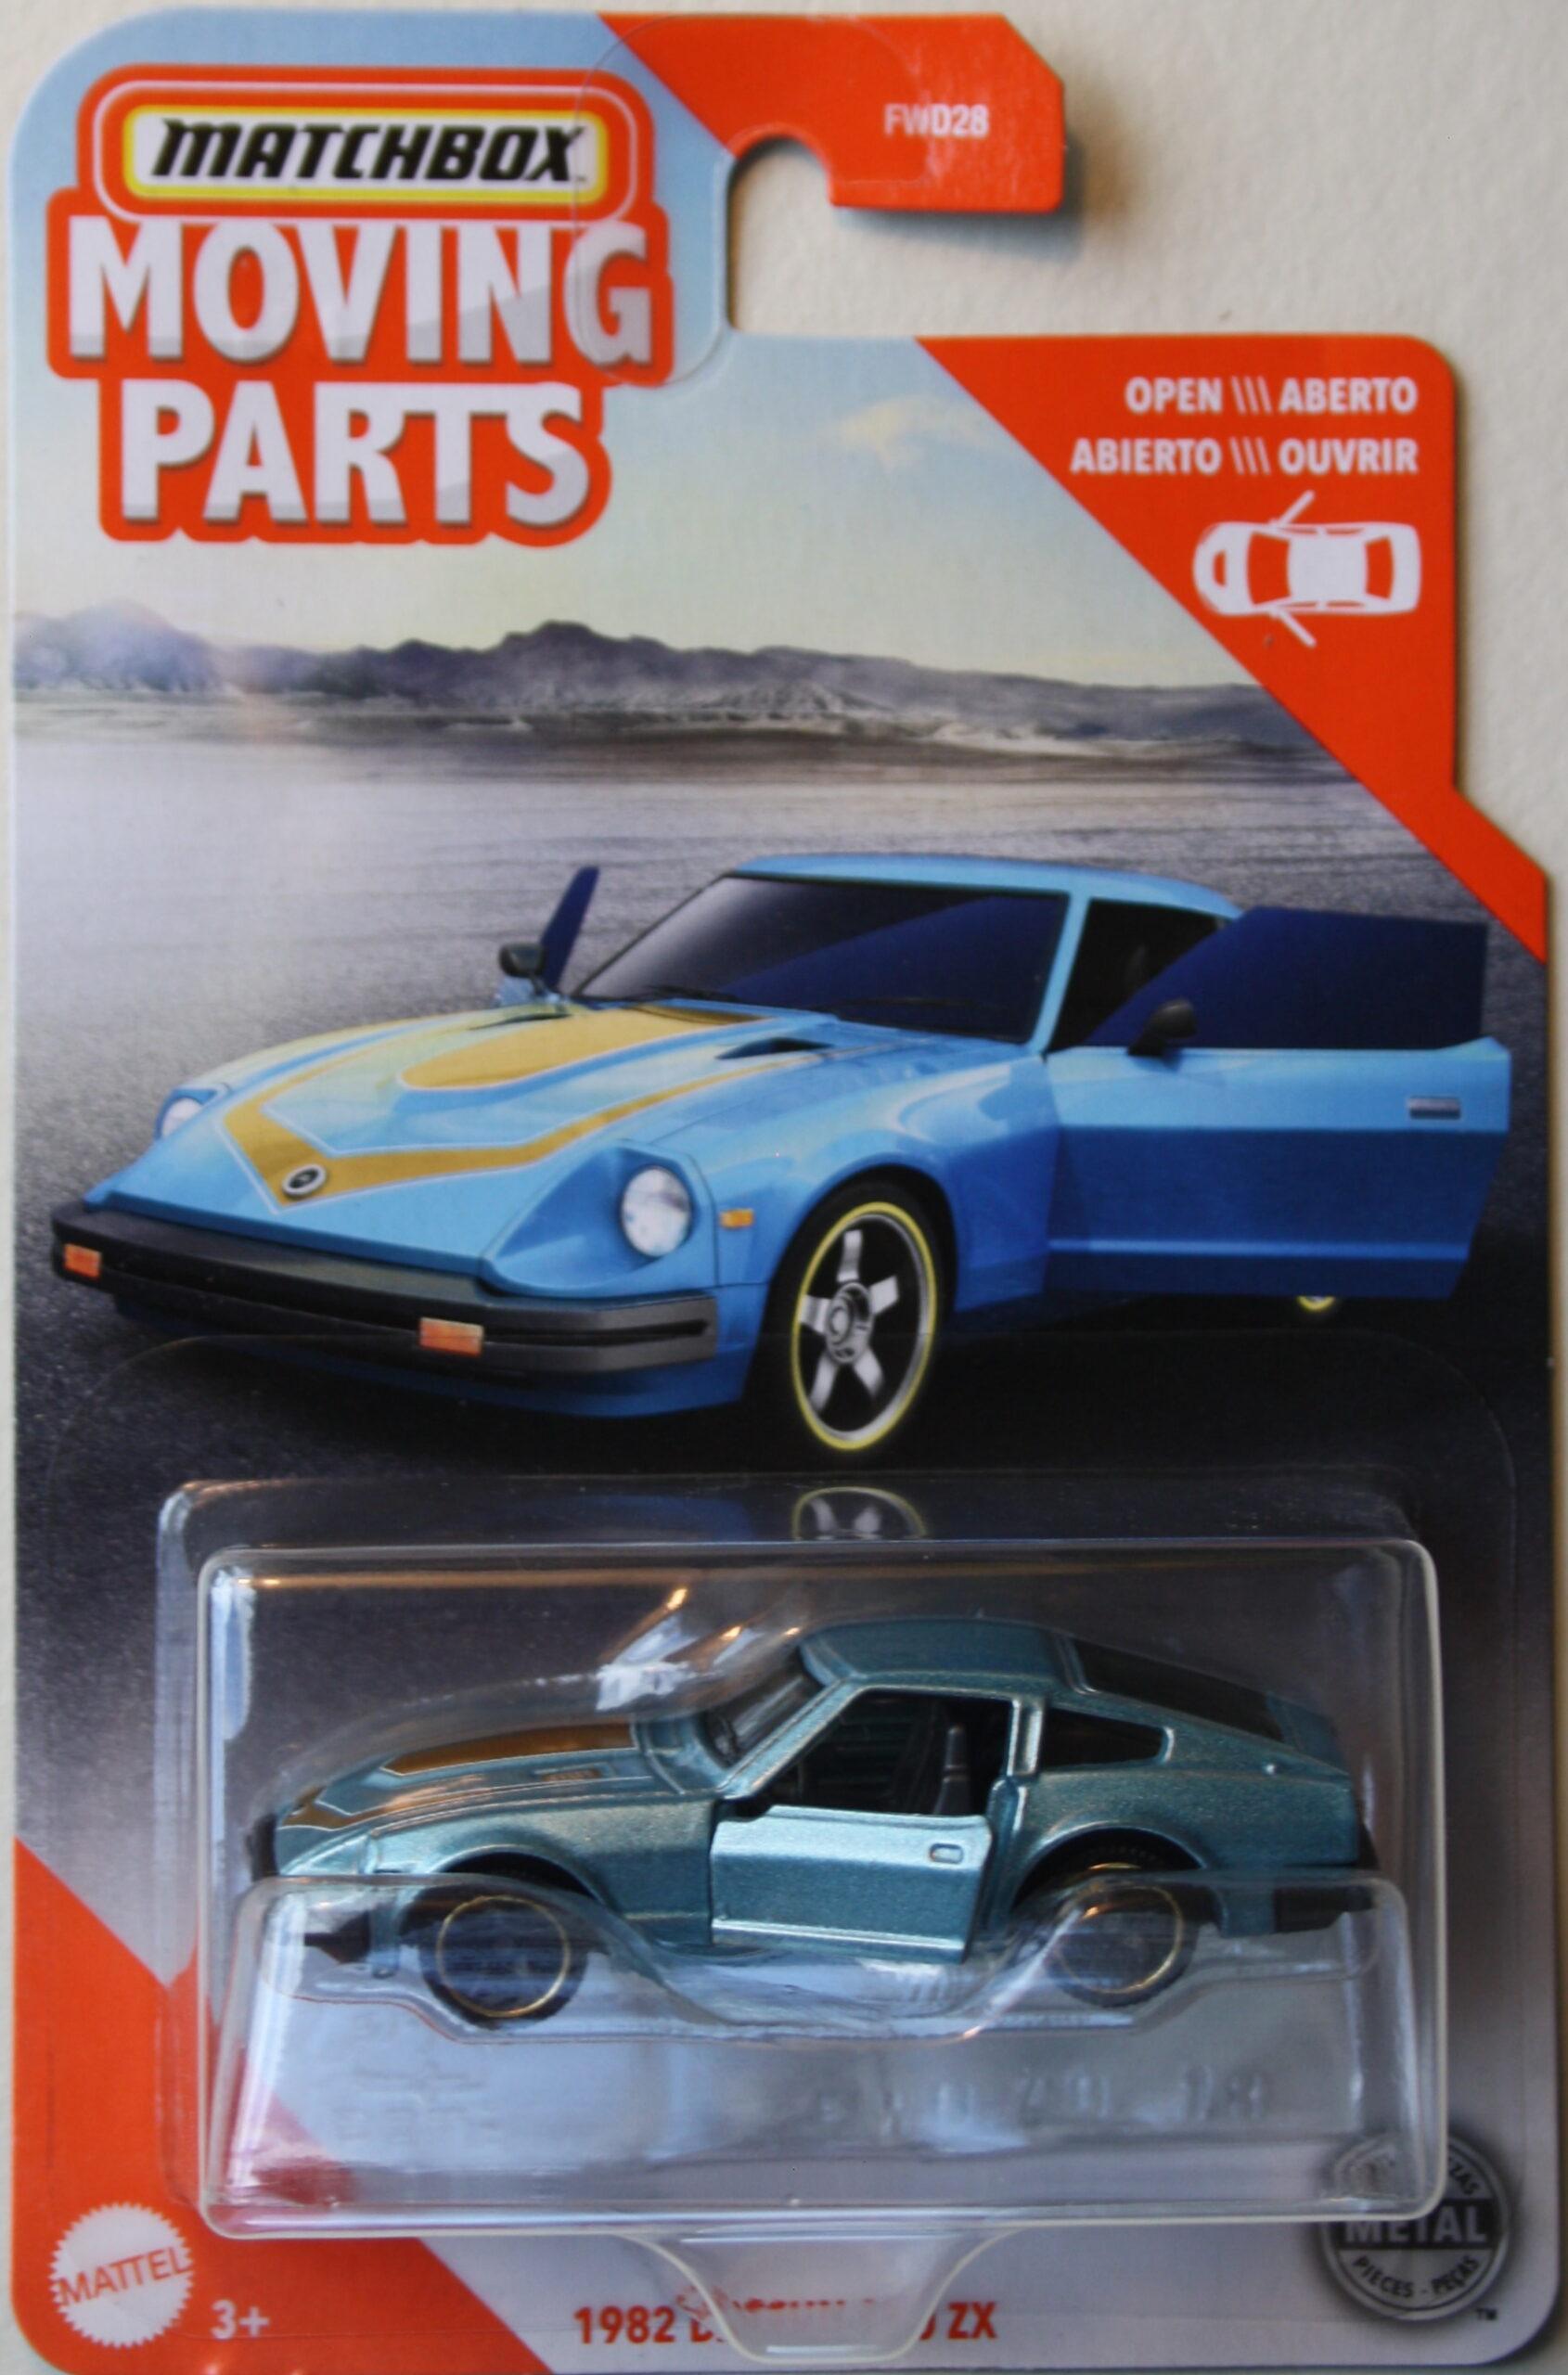 Matchbox Moving Parts, 1982 Datsun 280 ZX, blue